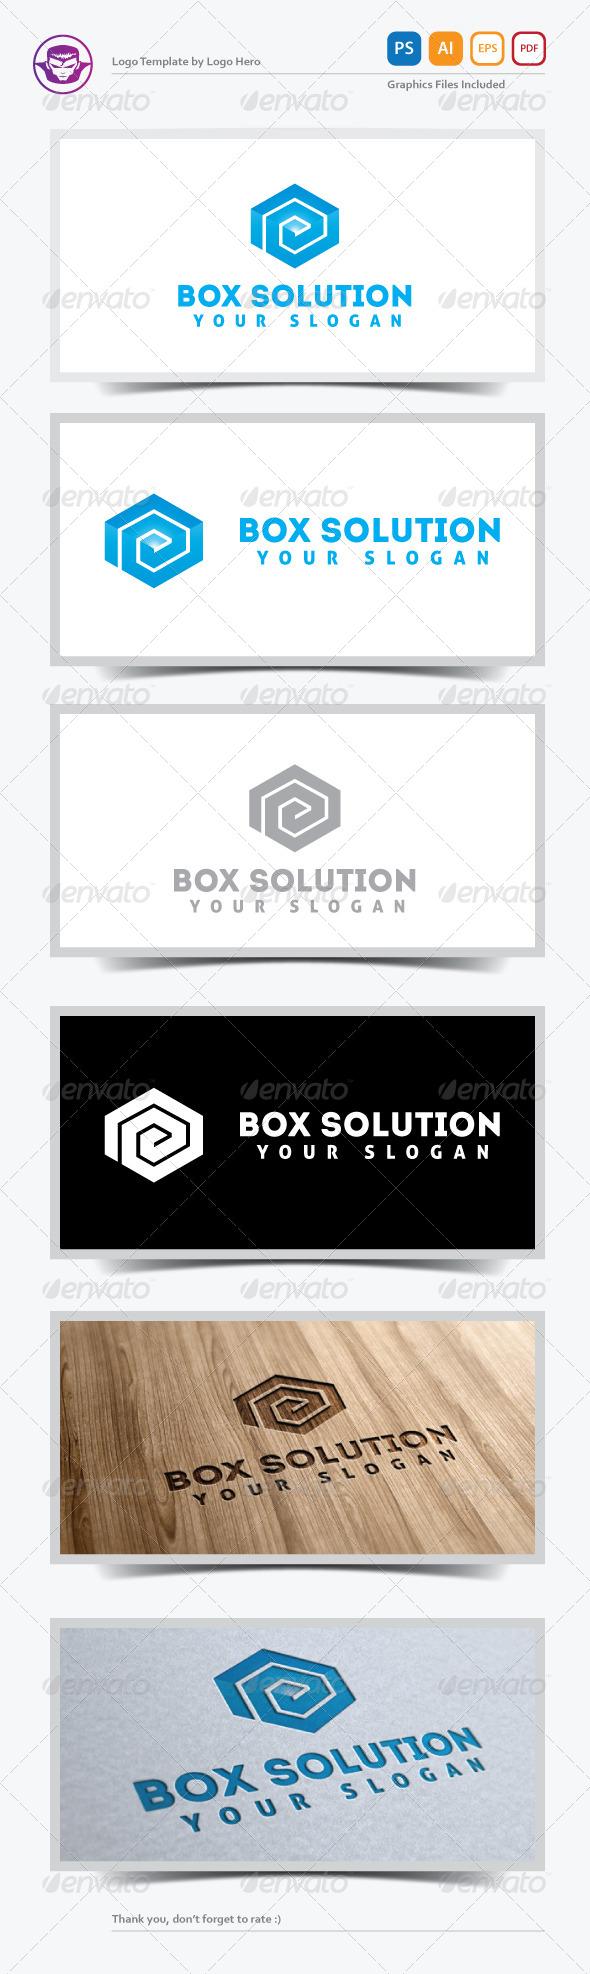 GraphicRiver Box Solution Logo Template 5284211